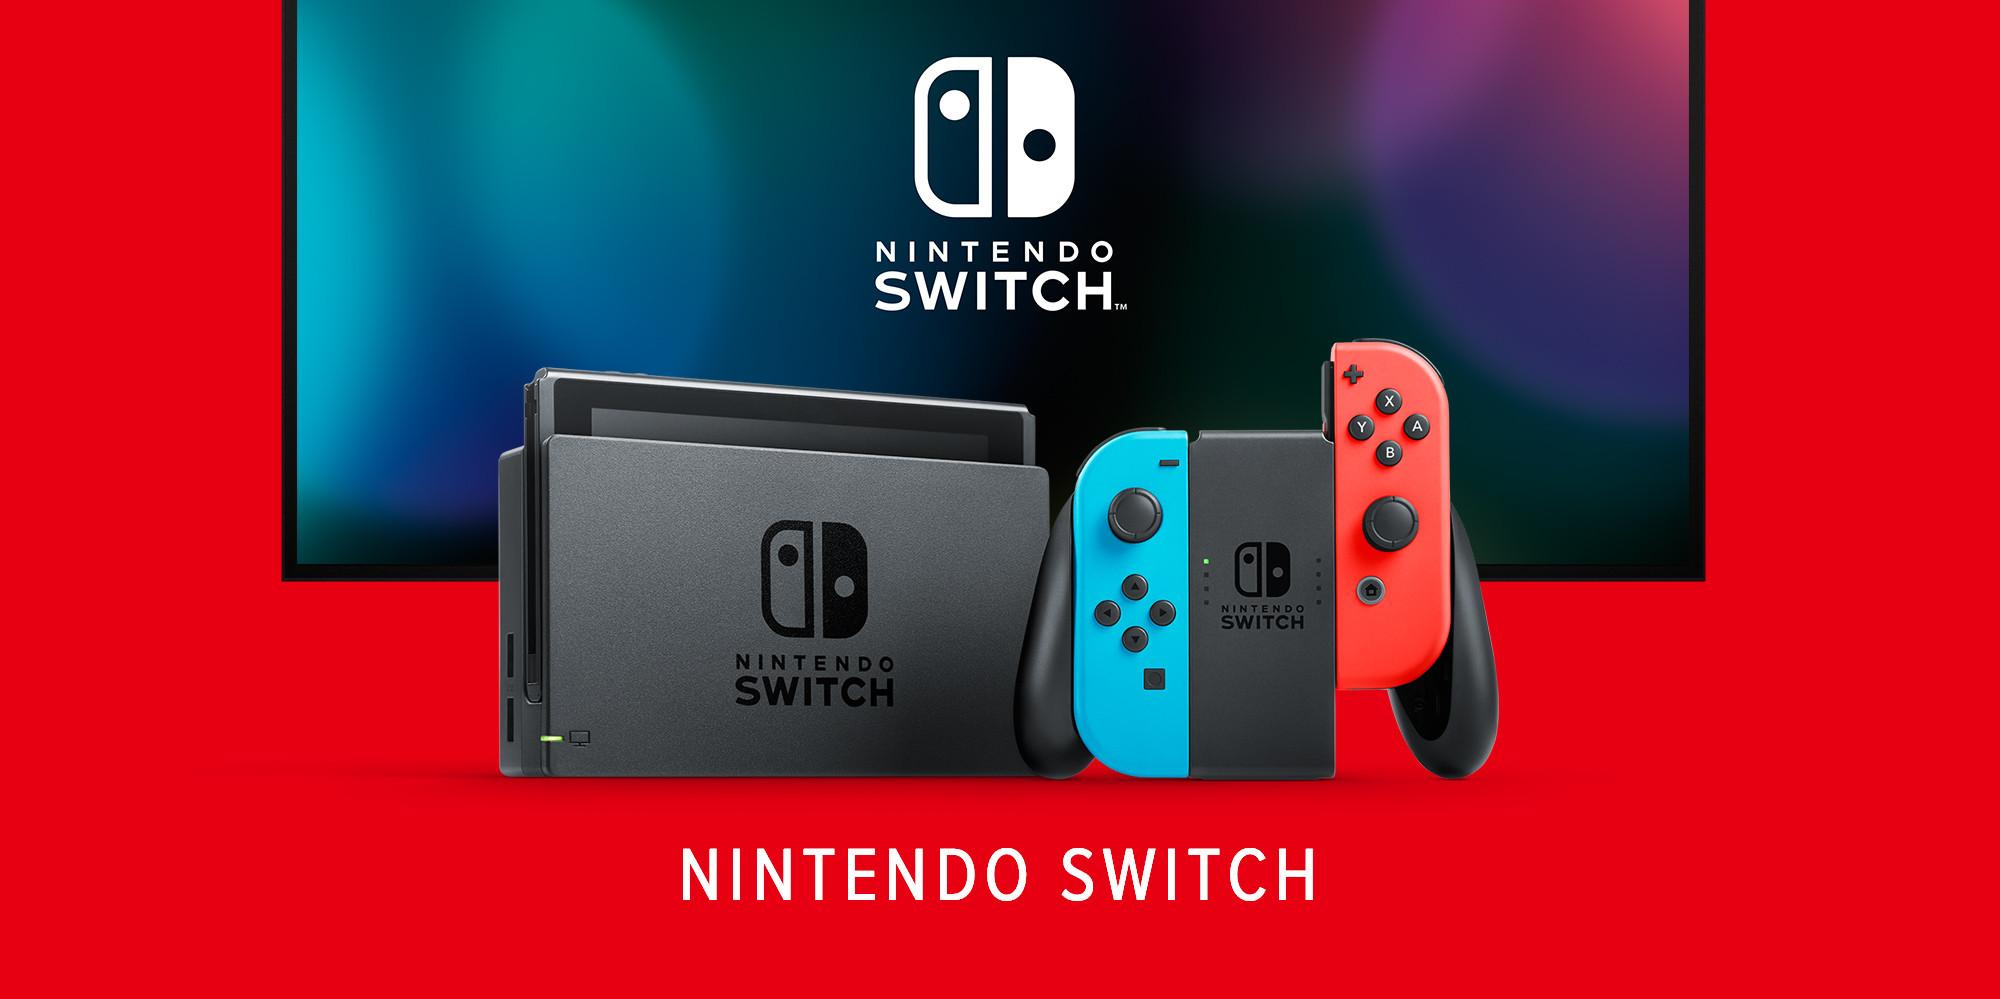 nintendo switch firmware update 10.1.0